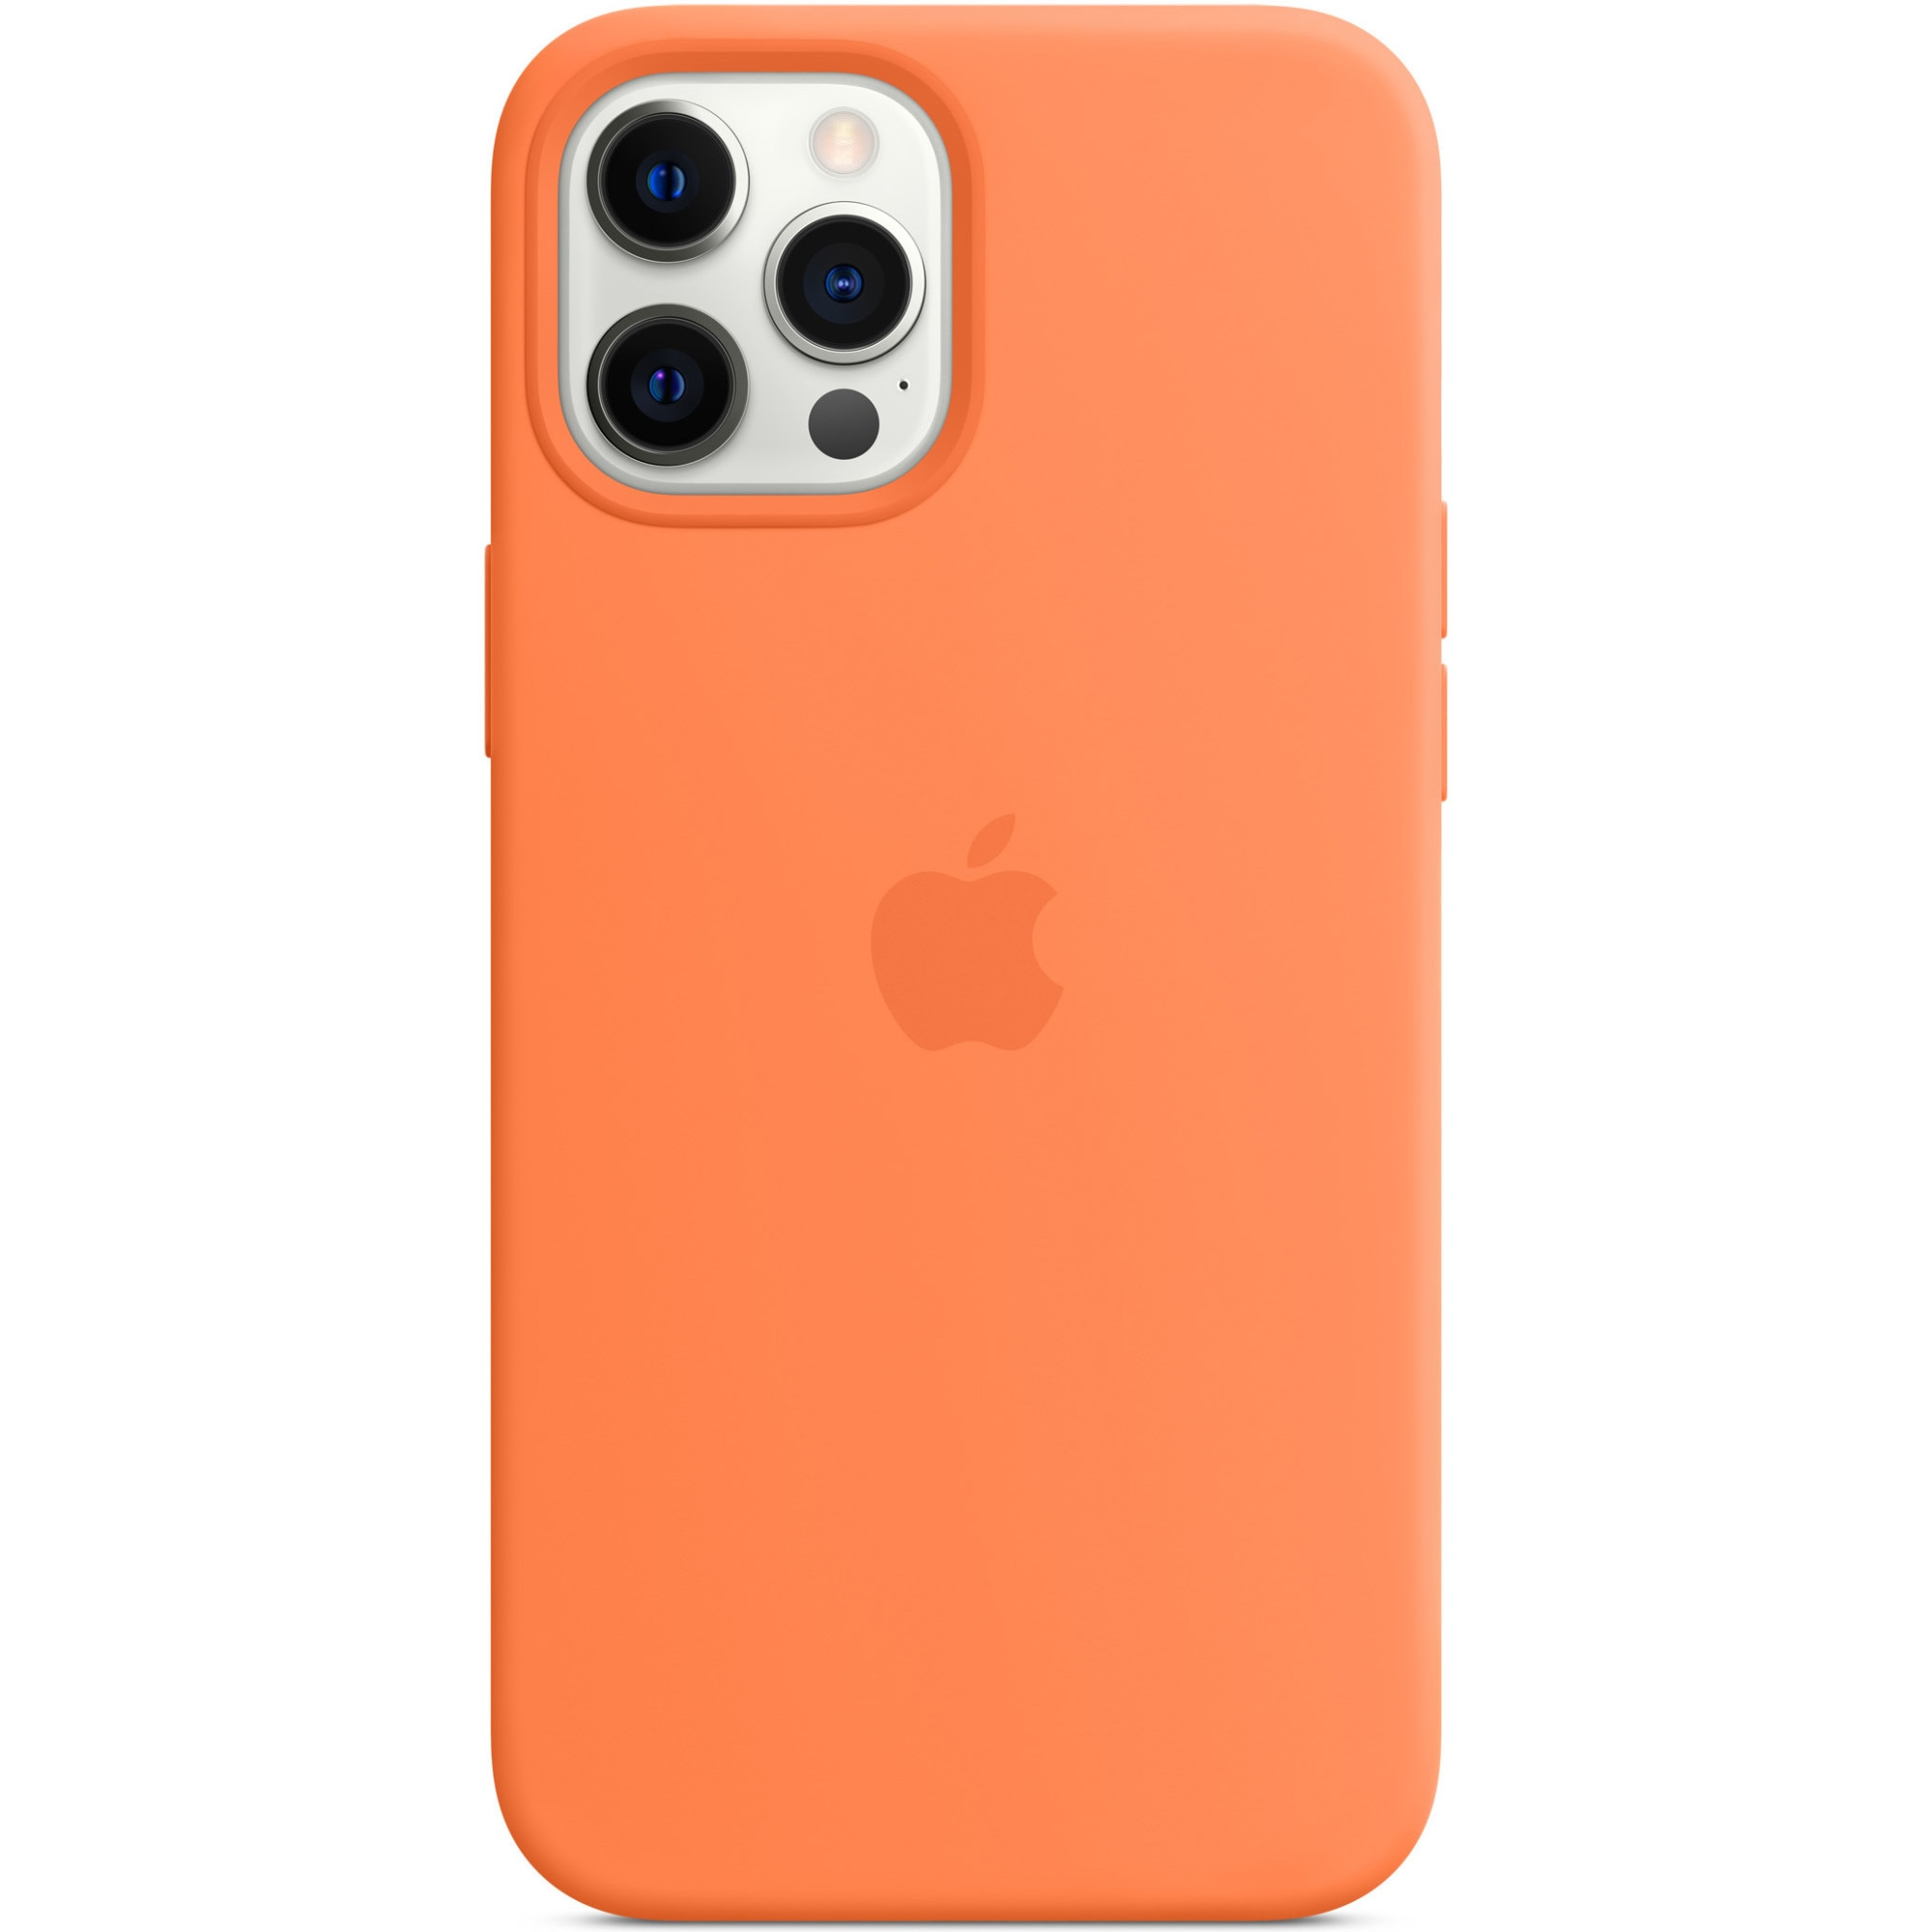 Fotografie Husa de protectie Apple Silicone Case MagSafe pentru iPhone 12 Pro Max, Kumquat